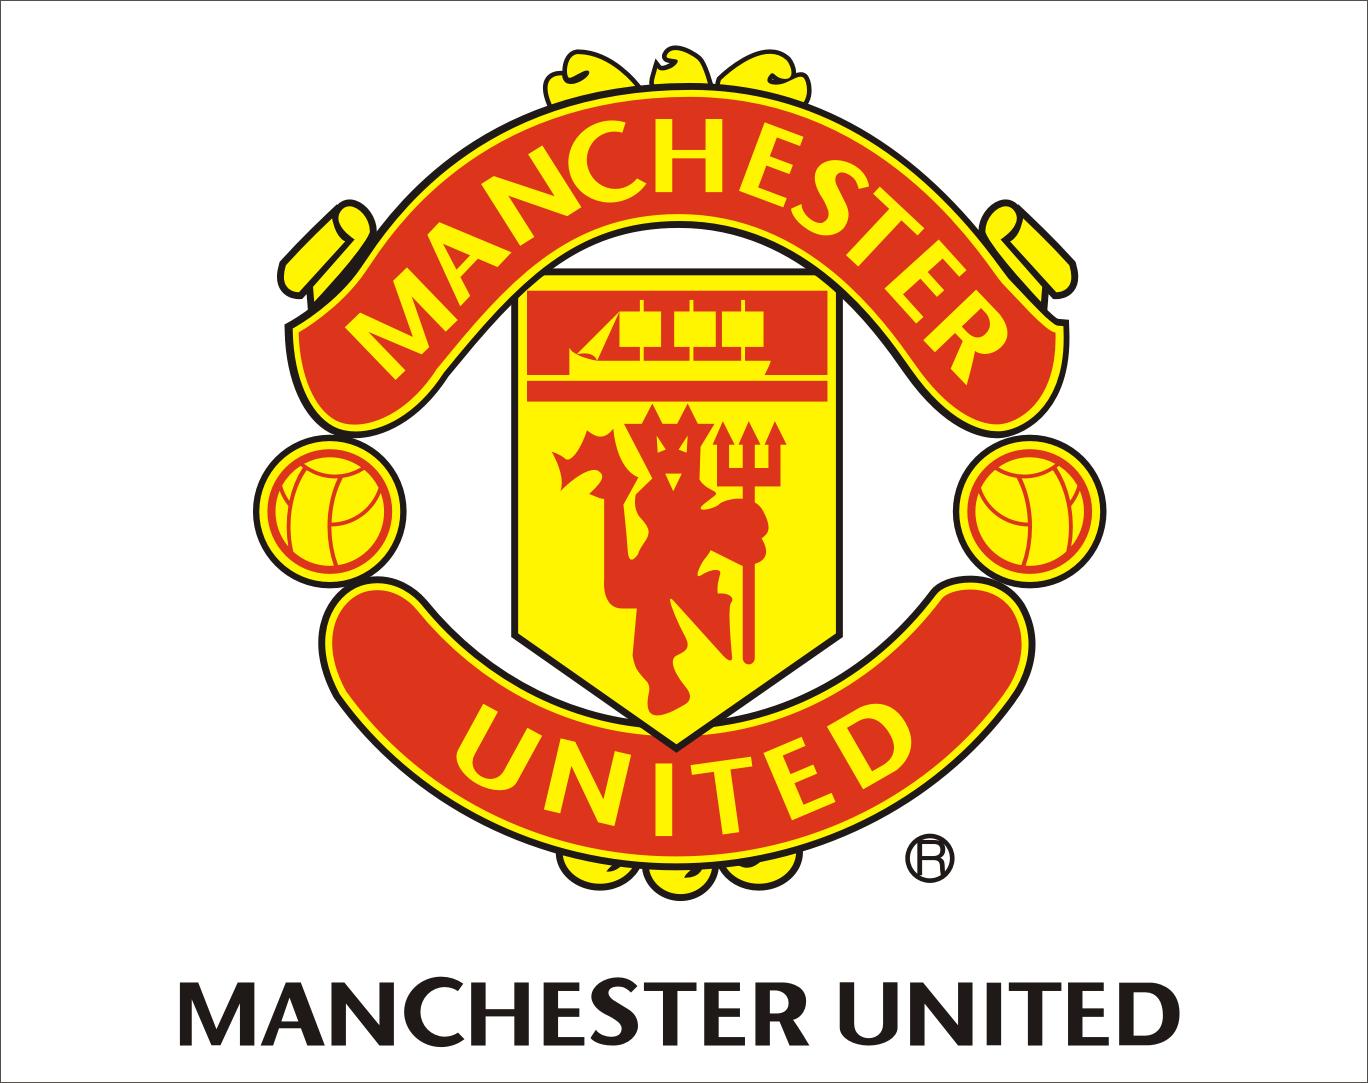 Manchester United Logo Design - Http://manchesterunitedwallpapers Pluspng.com/ Manchester-united - Manchester United Logo PNG